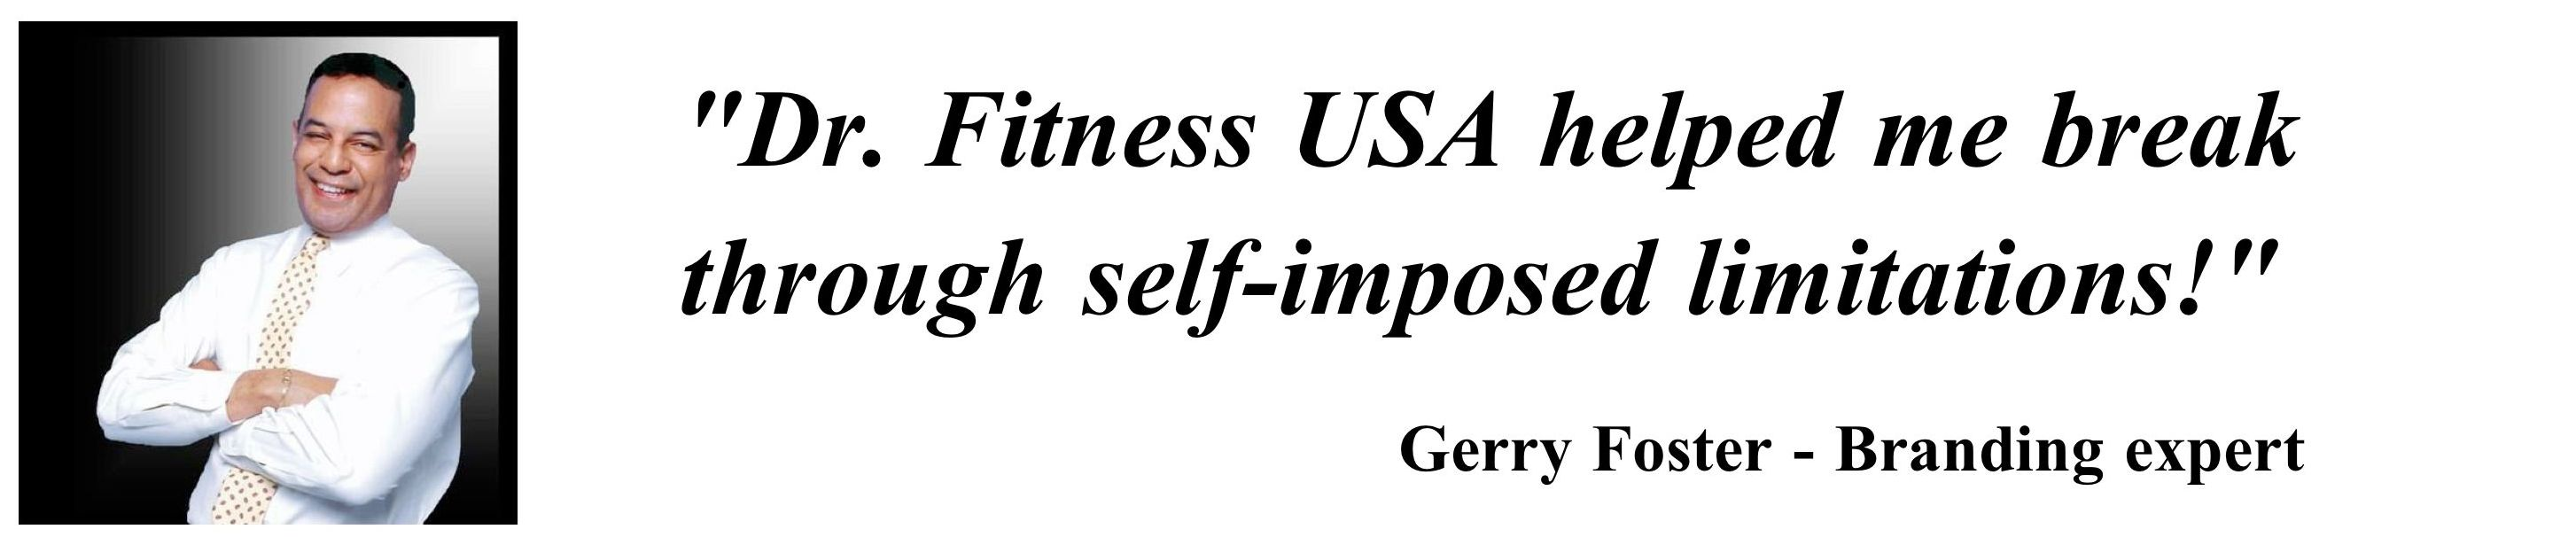 gerry testimonial